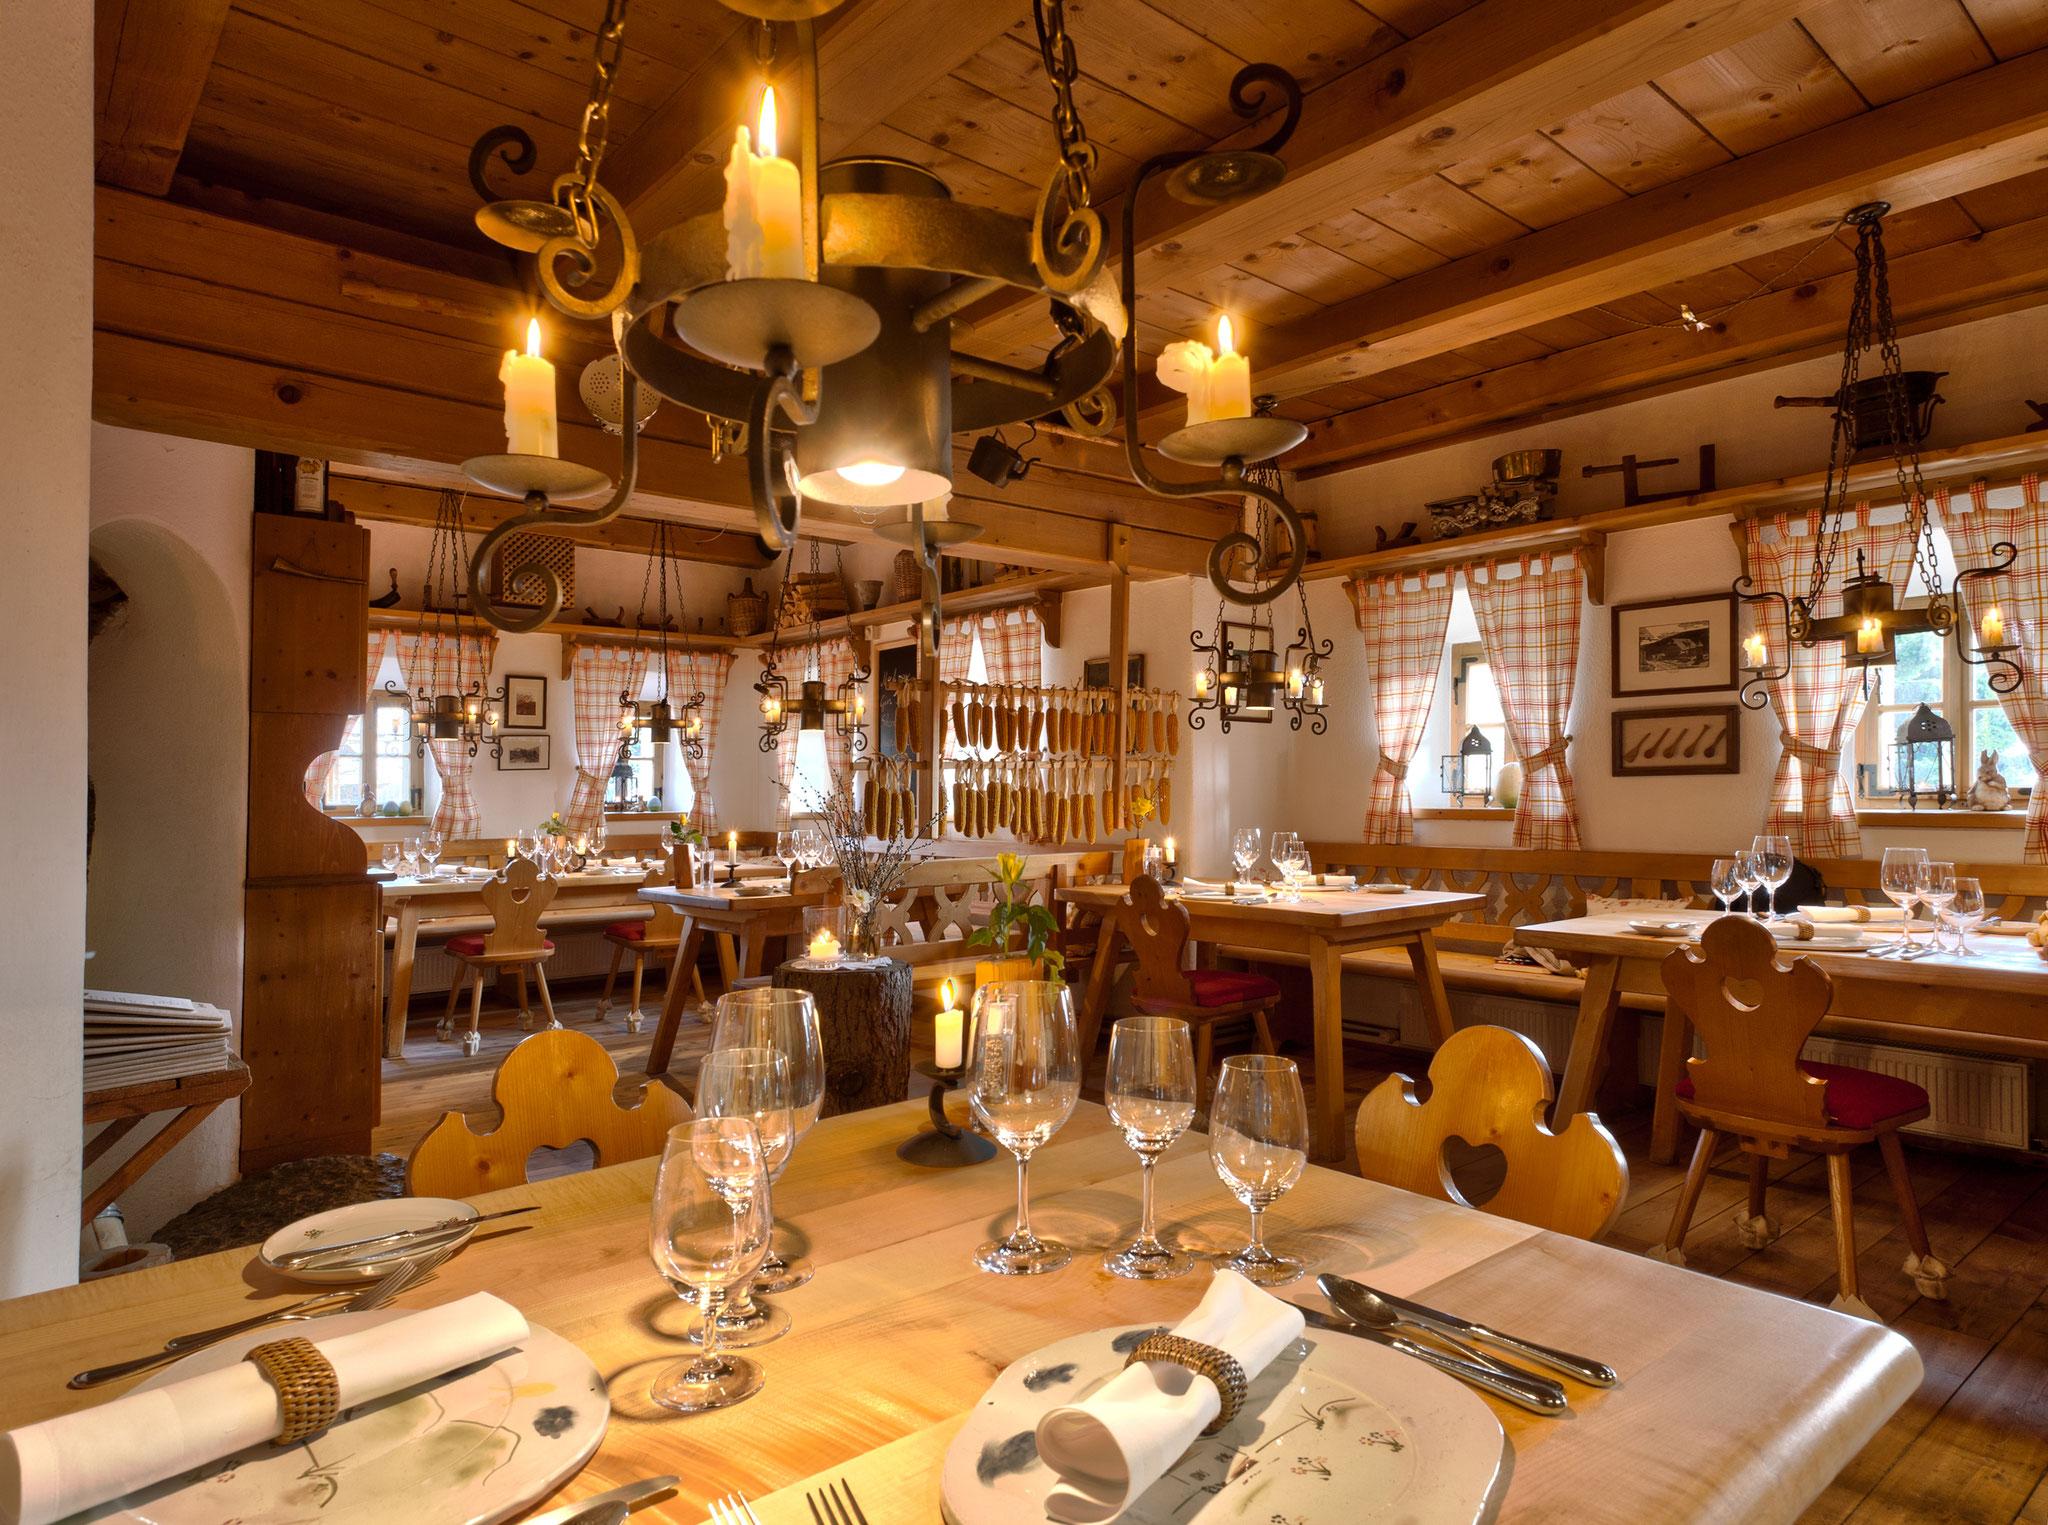 Gasthaus Fellacher Innen